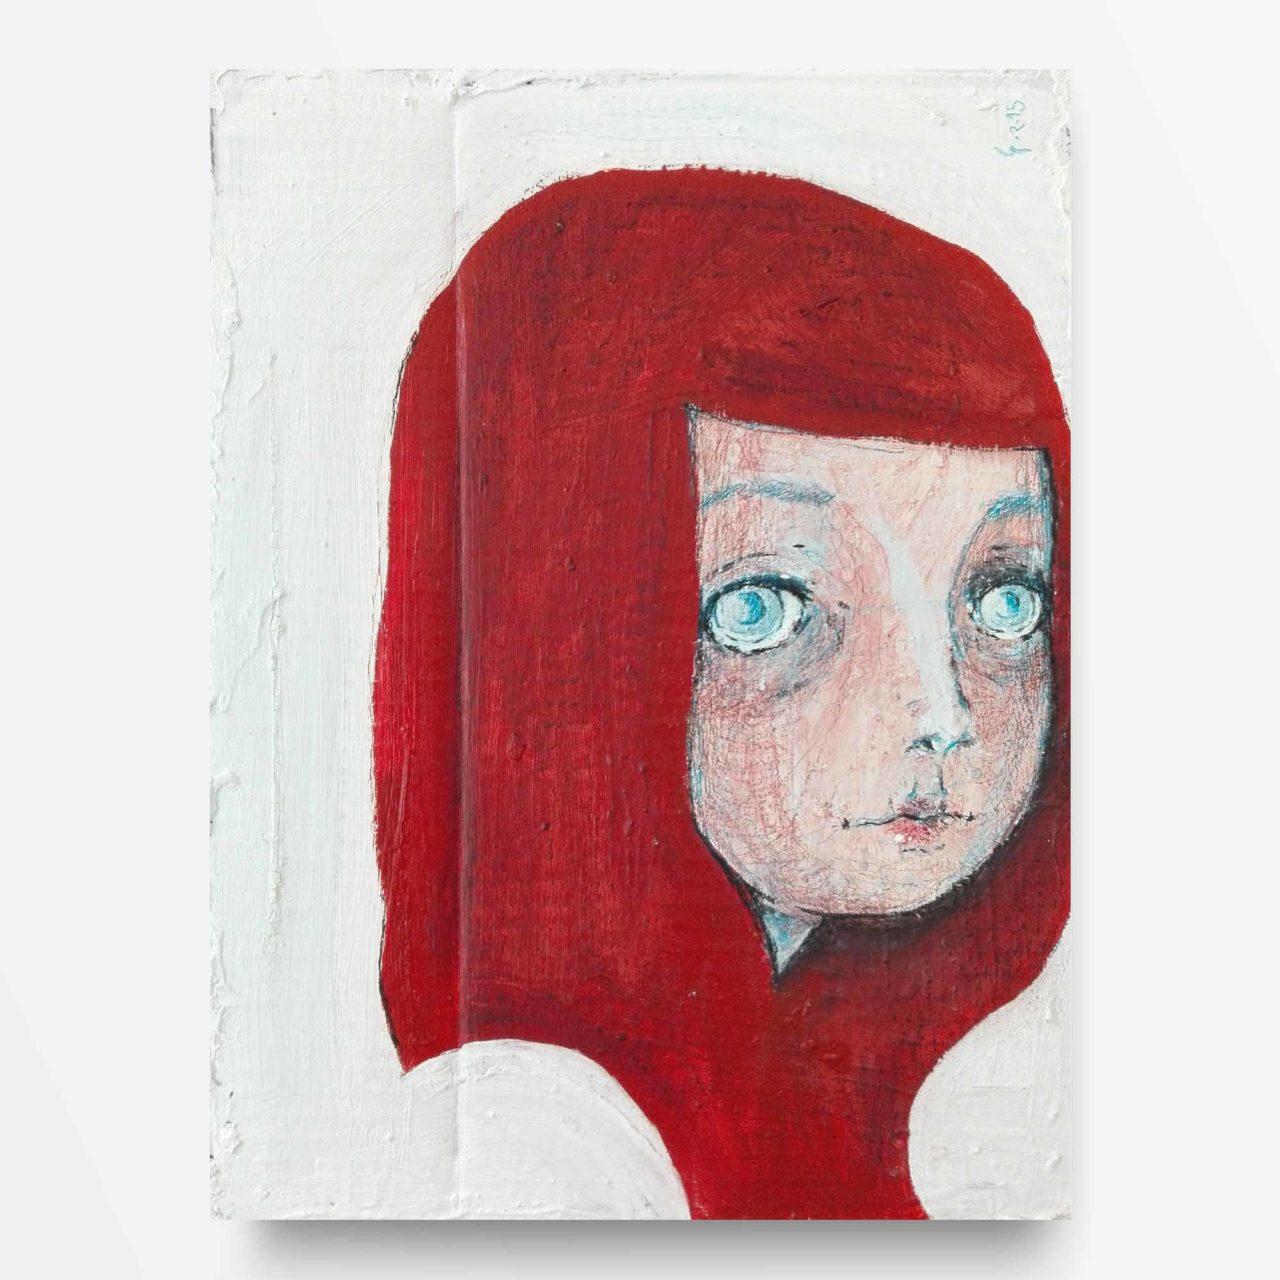 2015 Burnout Ragazza dai Capelli Rossi Pittura contemporanea Diego Gabriele